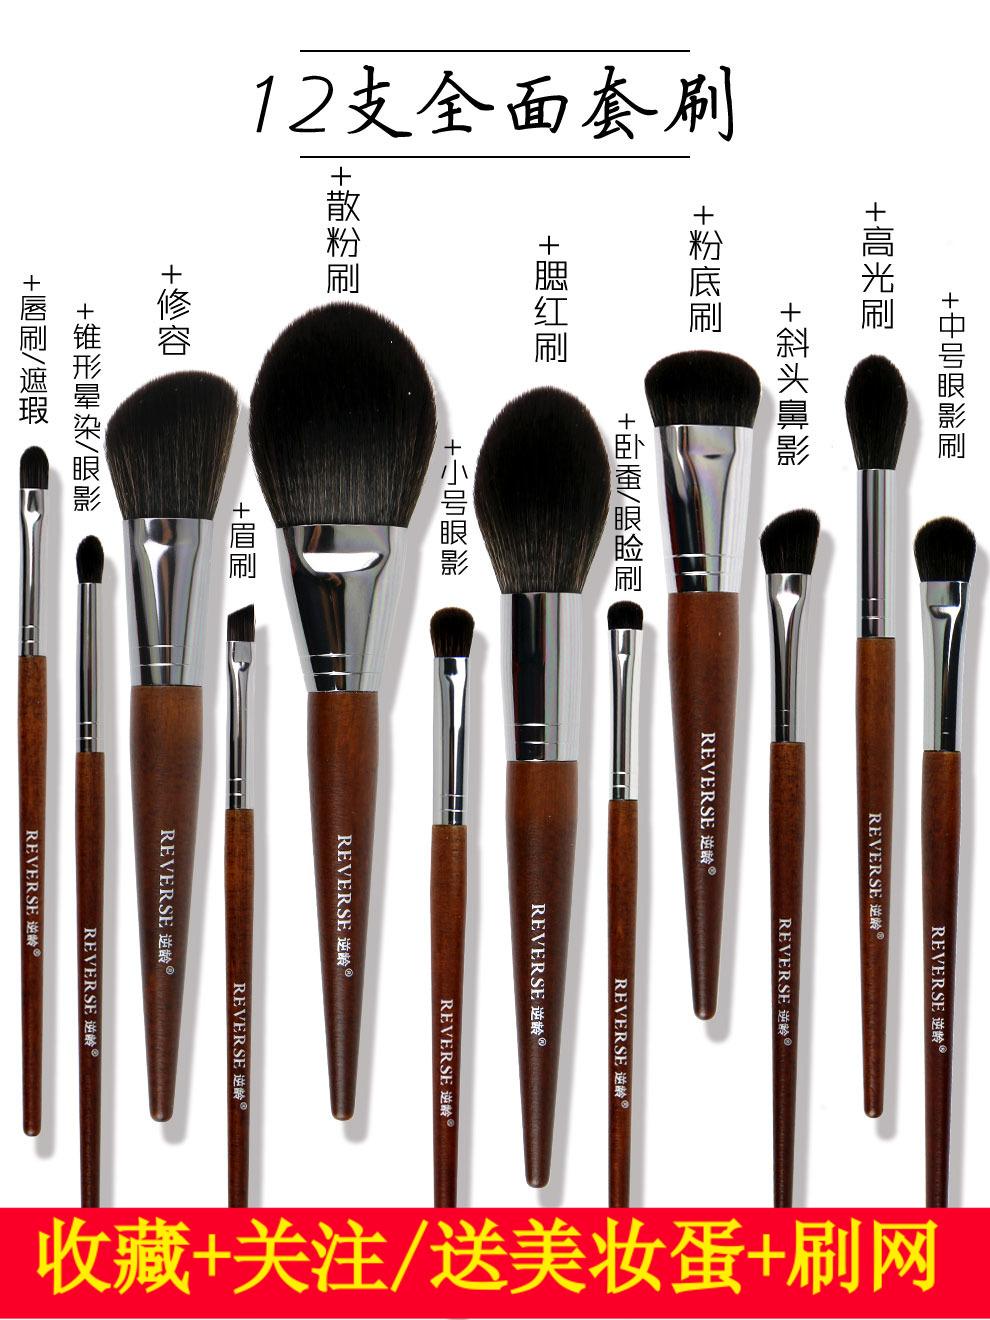 Redino 12 makeup brush set loose powder blush high gloss eye shadow brush beauty makeup makeup beauty tool